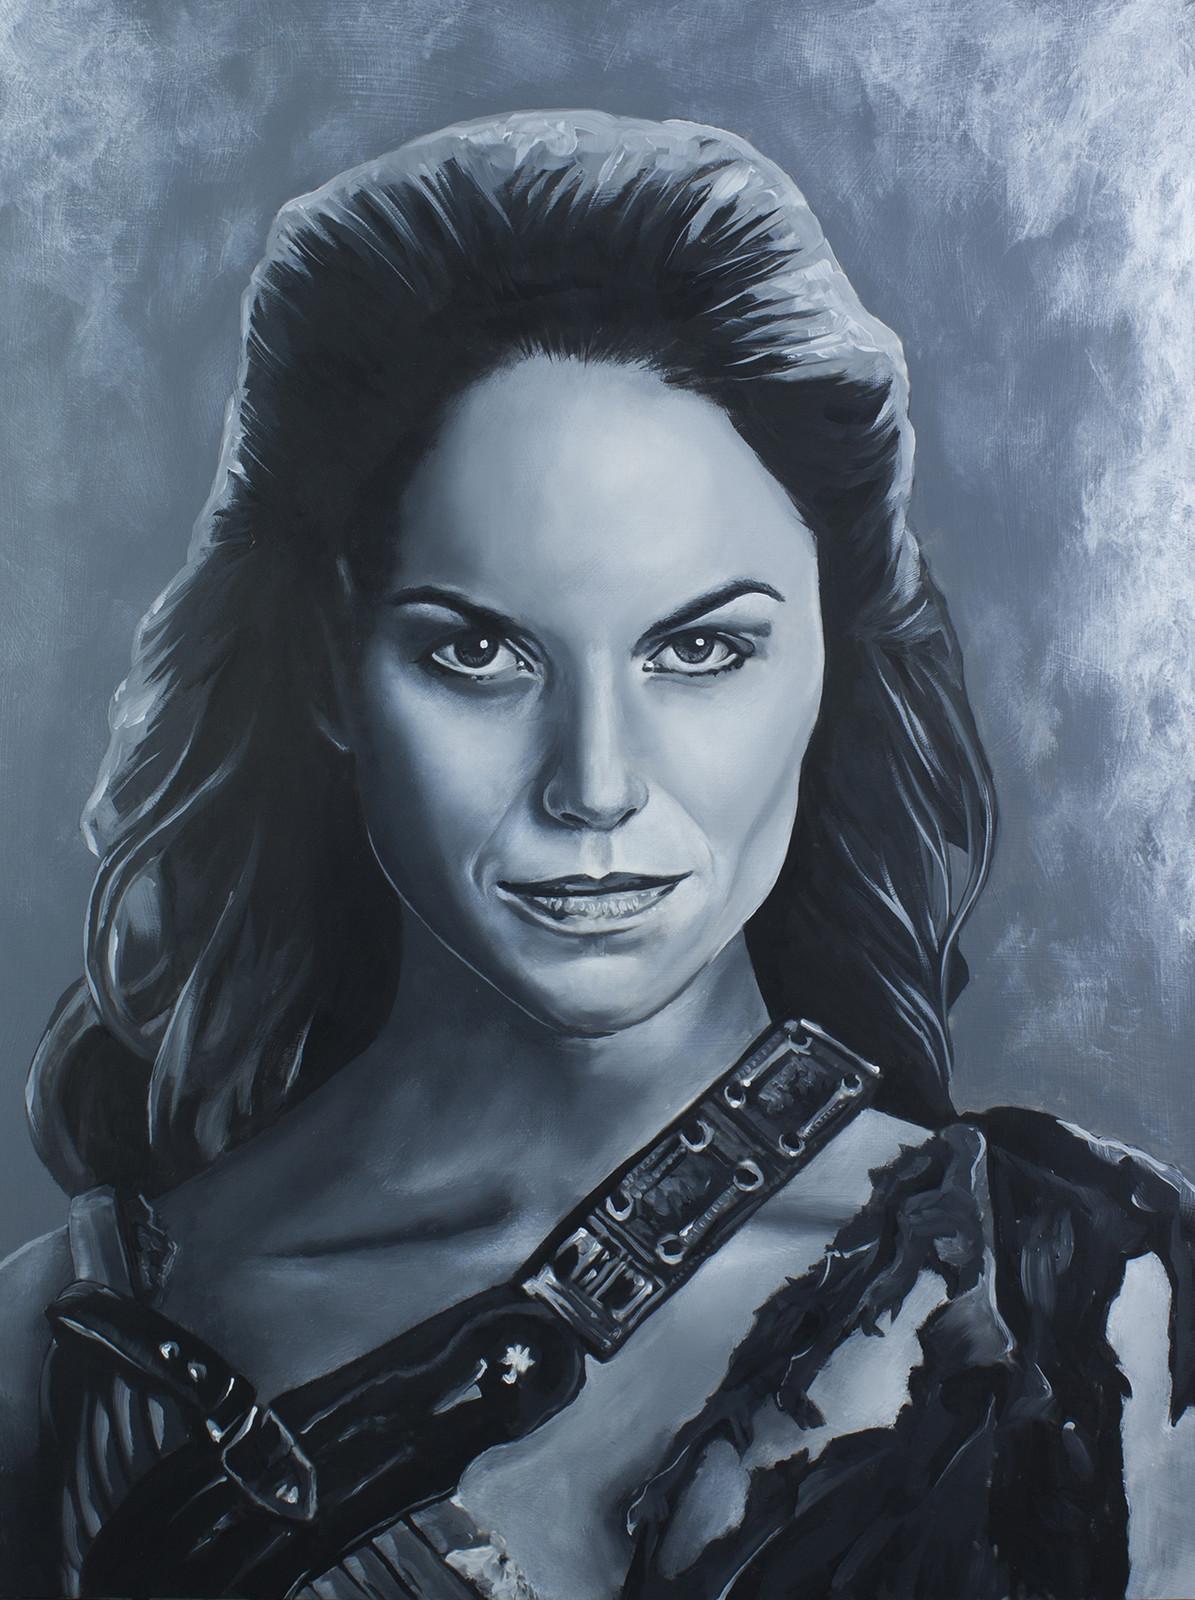 Saxa - Ellen Hollman Spartacus Series - Acrylic on board. 16x20